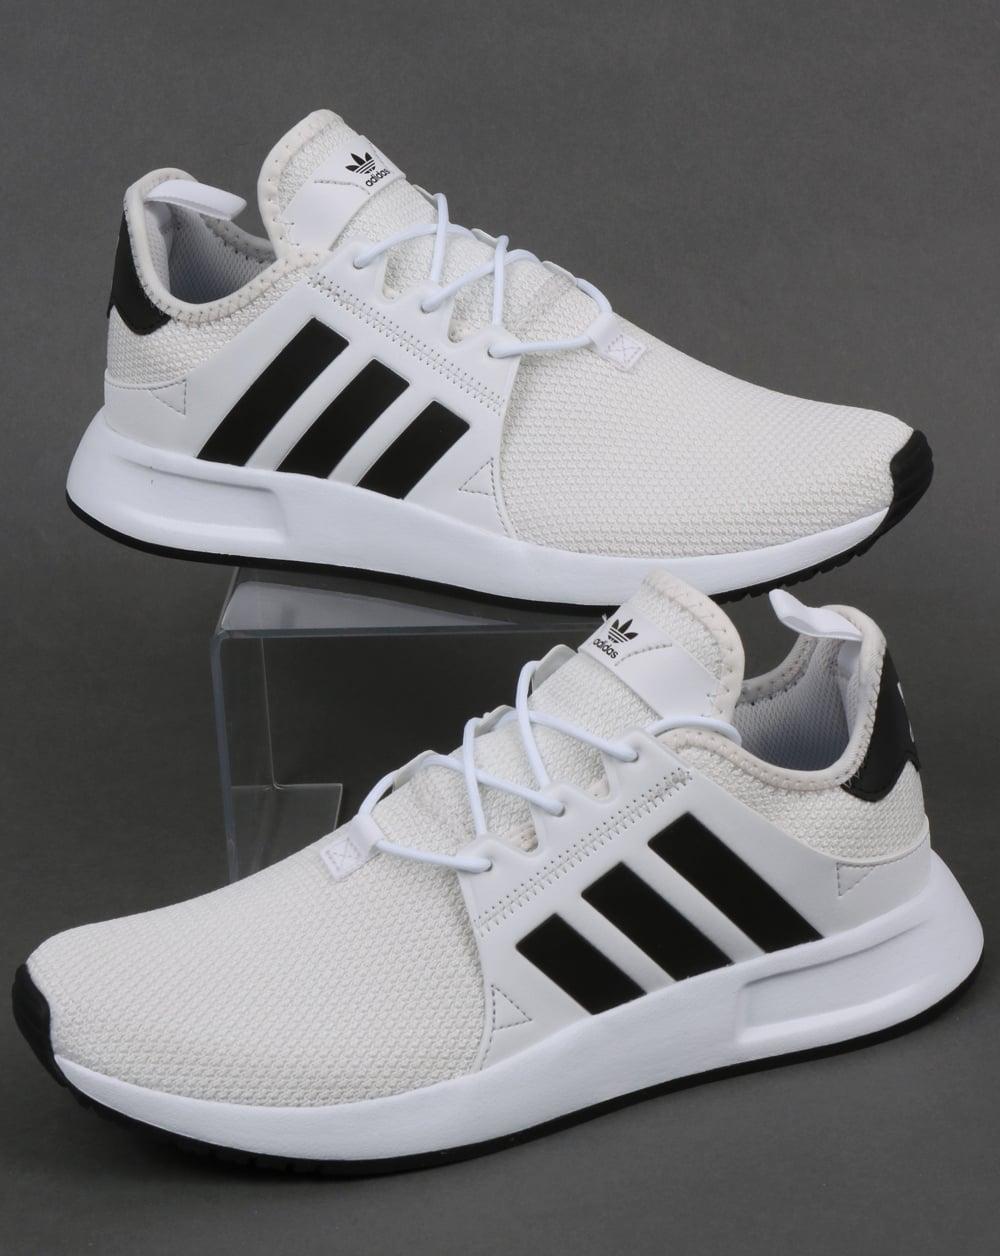 cca38442ab Adidas XPLR Trainers White Tint Black